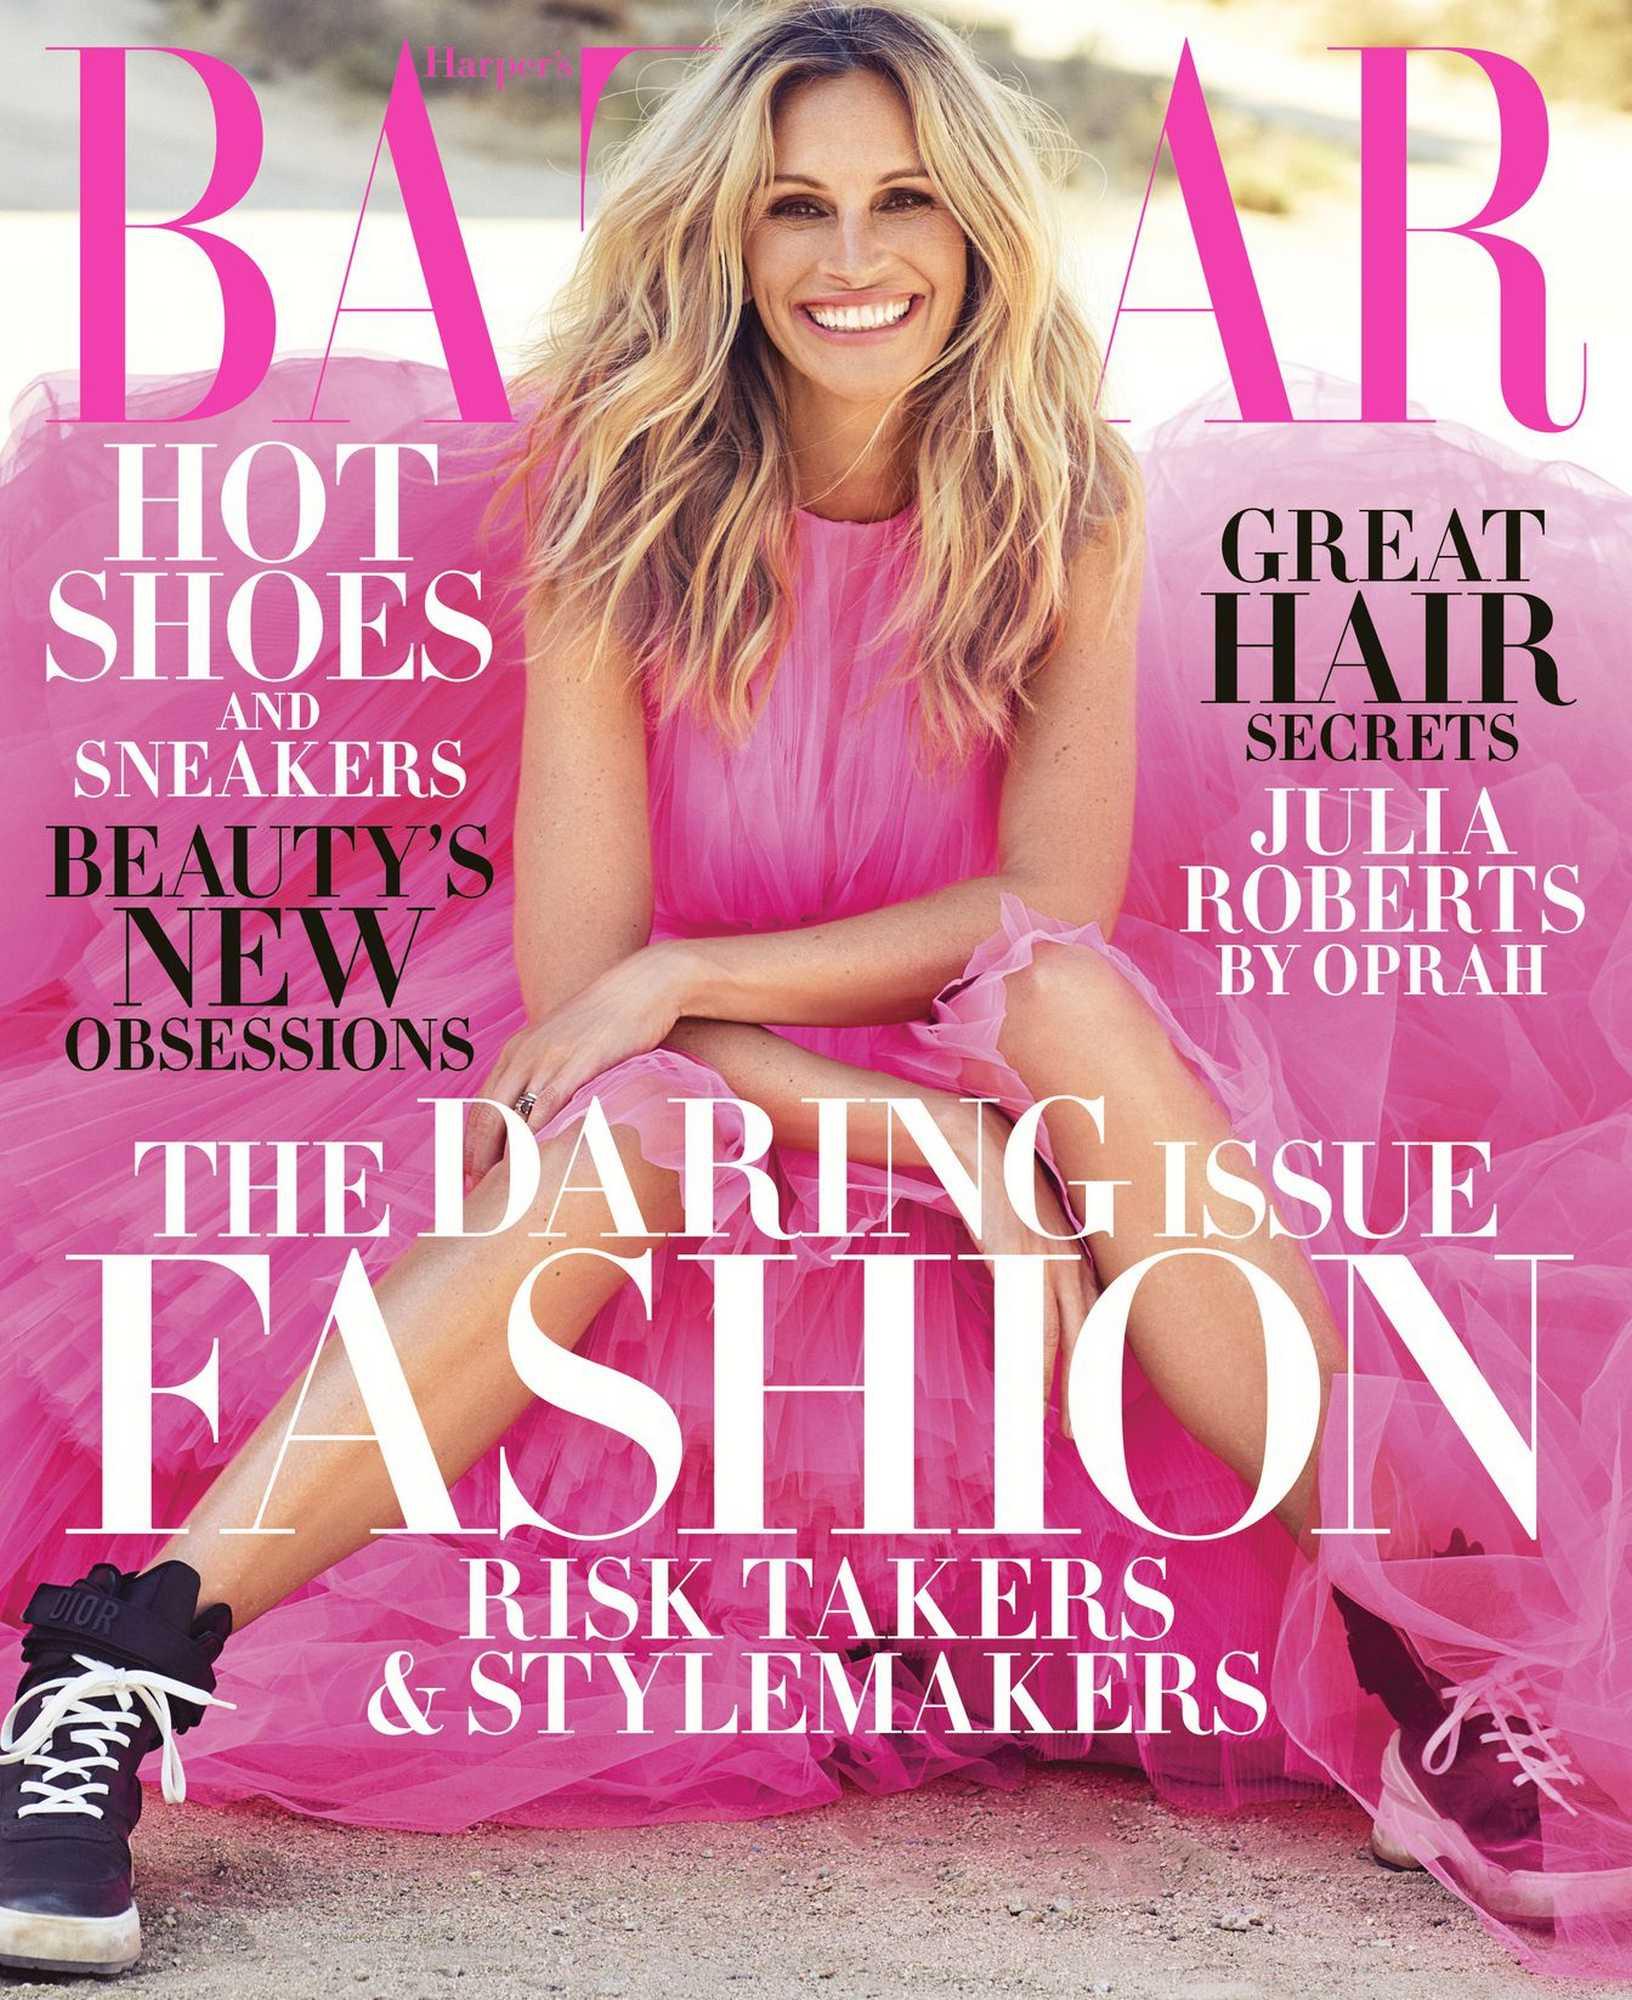 Julia-Roberts-US-Harpers-Bazaar-November-201842a5ca998803934.jpg